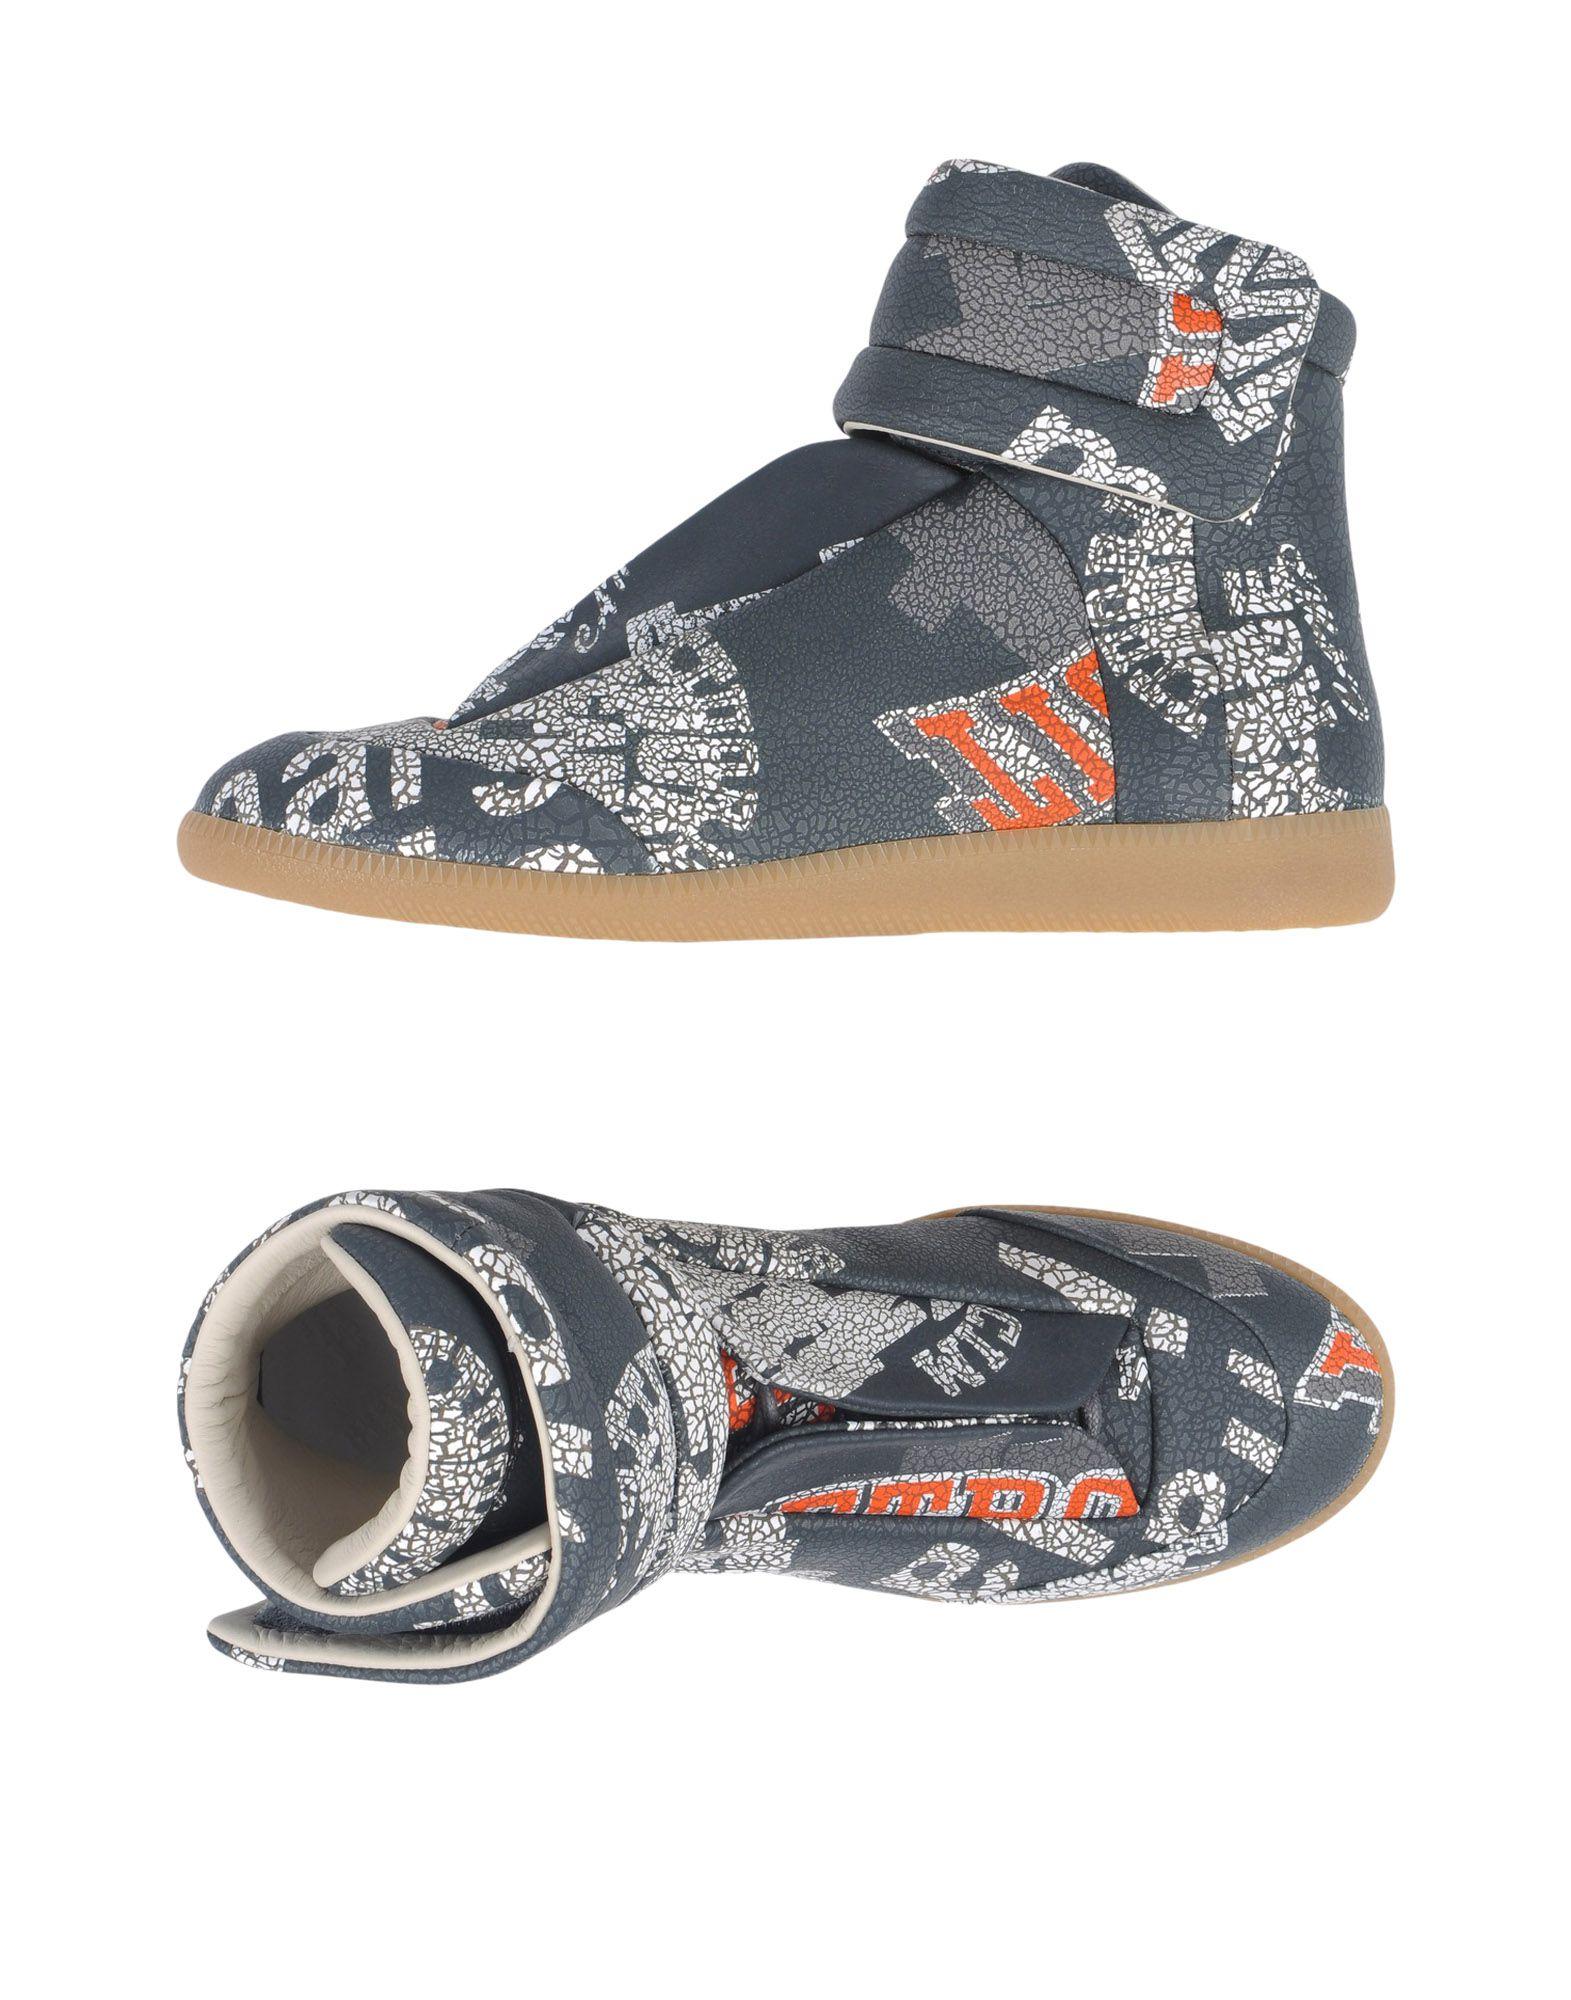 Maison Margiela Sneakers Herren  11351904EF Gute Qualität beliebte Schuhe